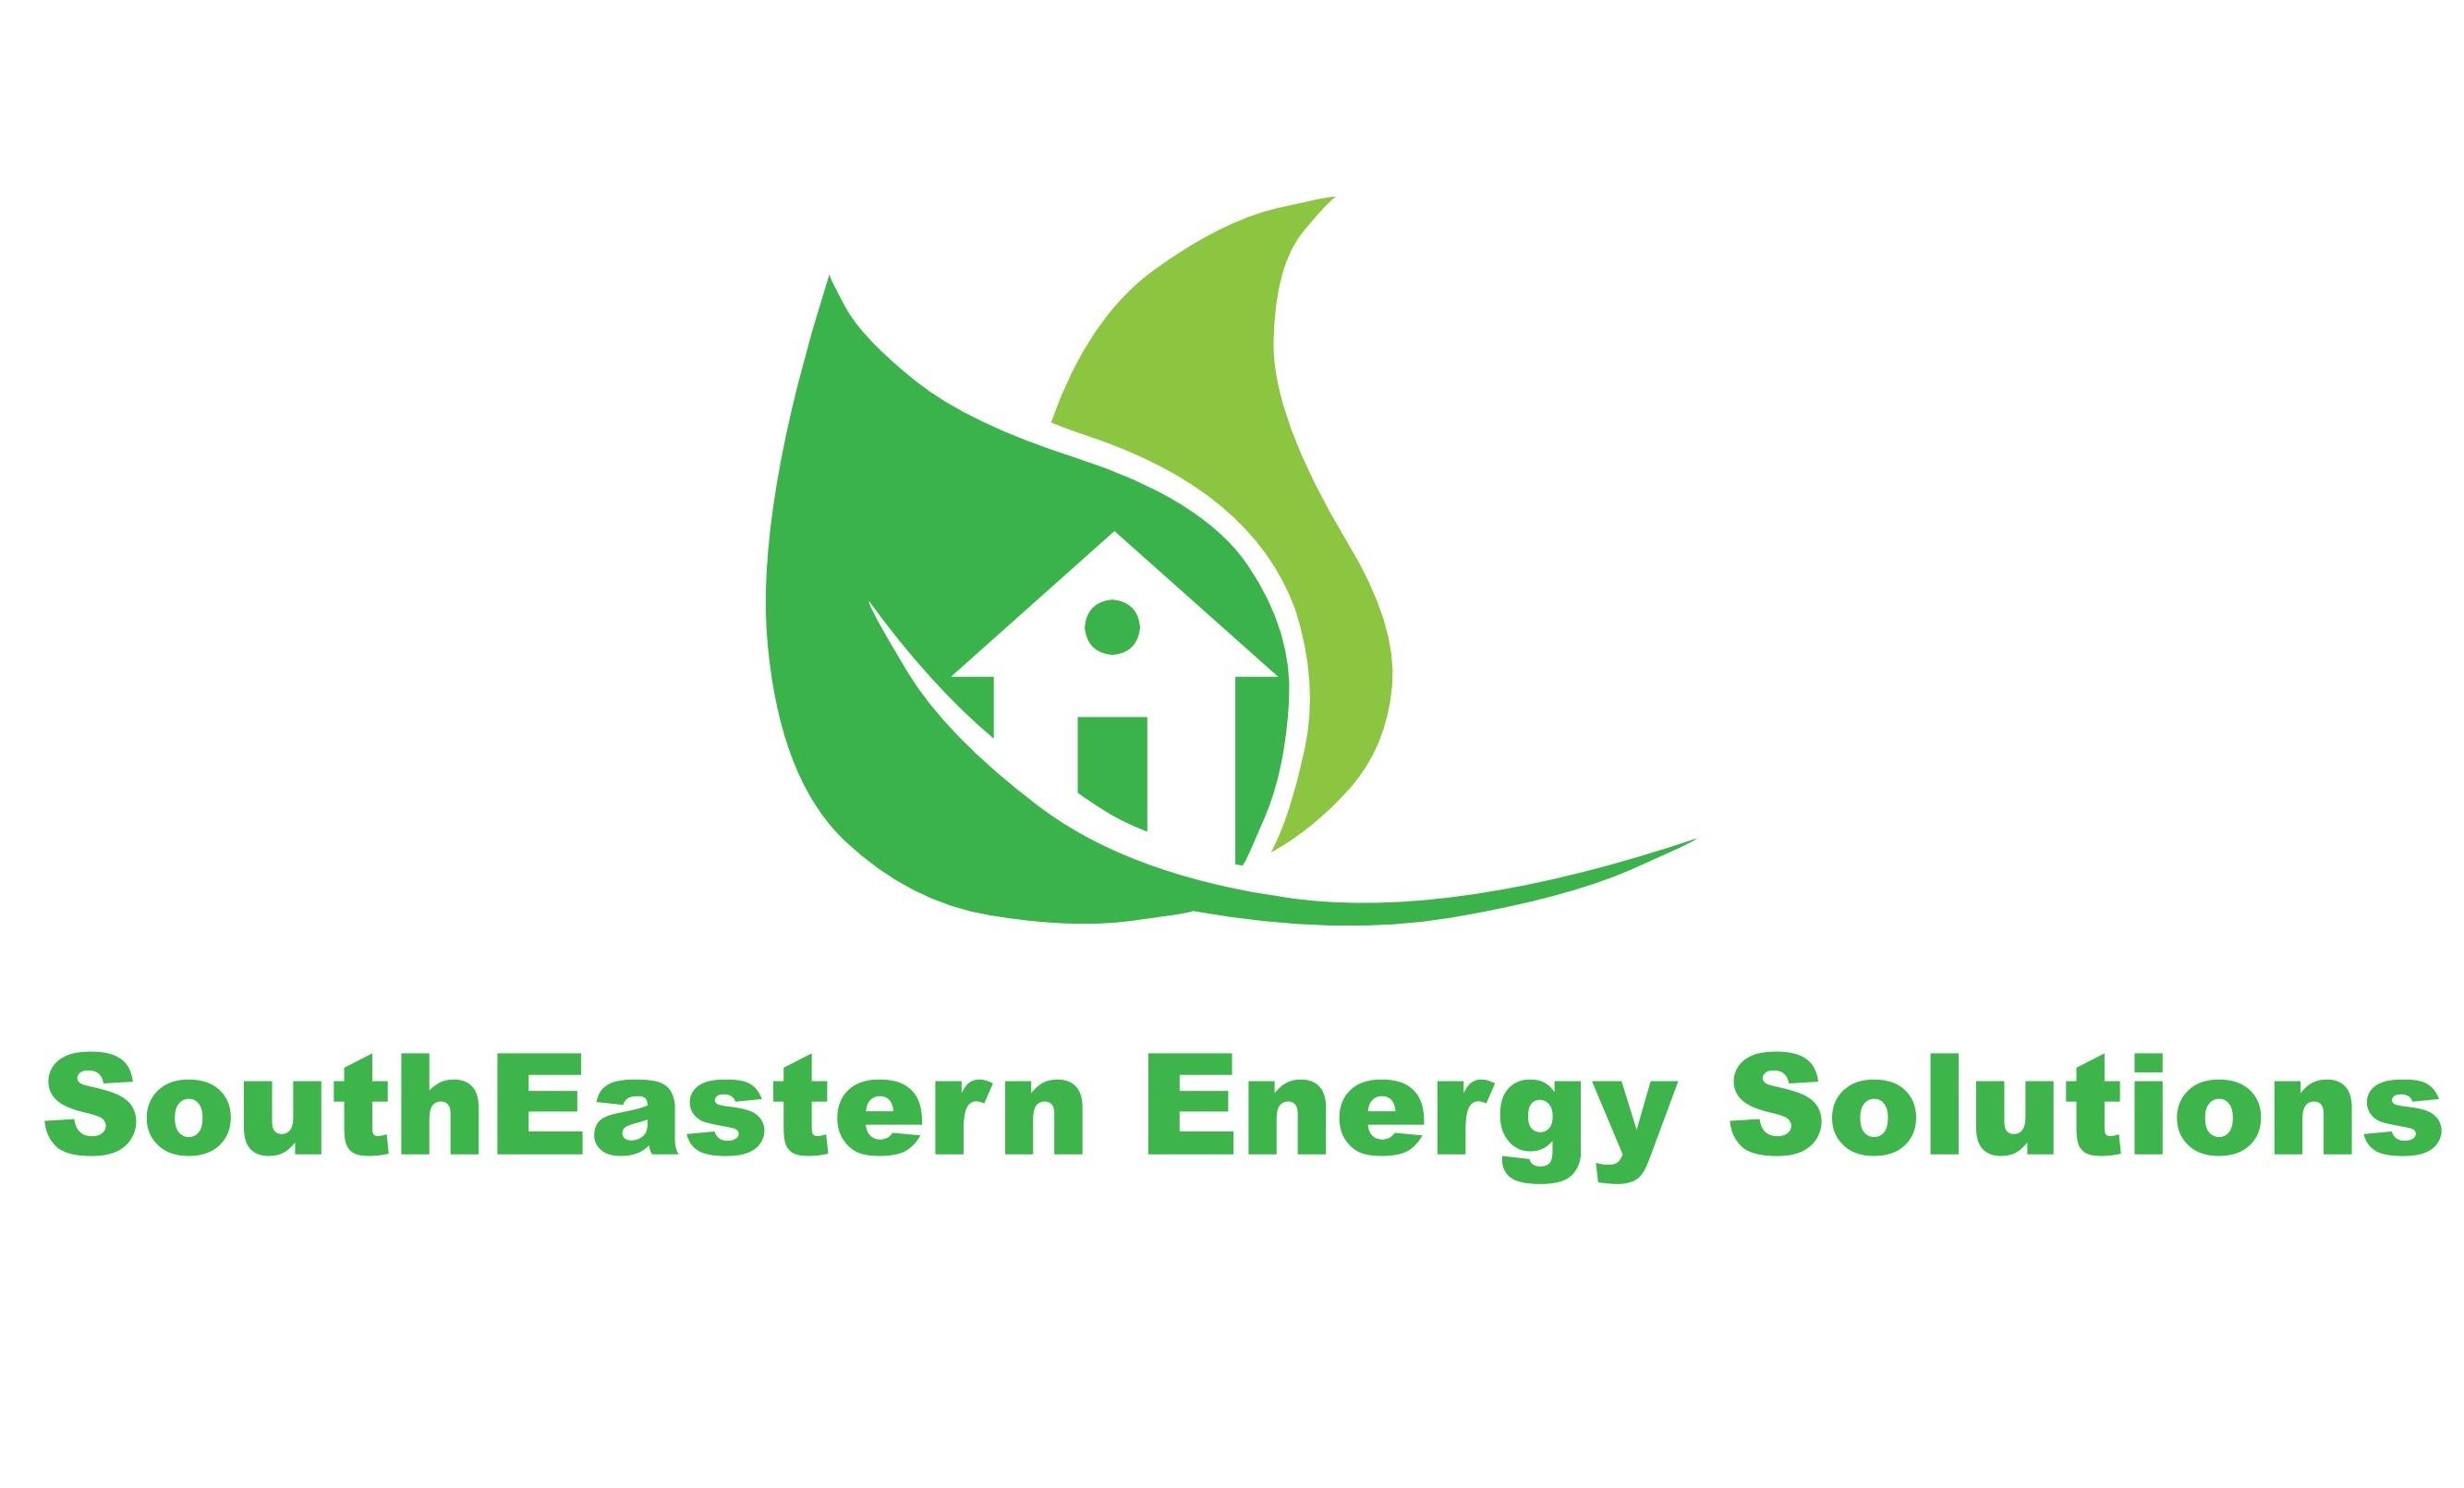 SouthEastern Energy Solutions - Pensacola, FL 32505 - (844)687-2839 | ShowMeLocal.com